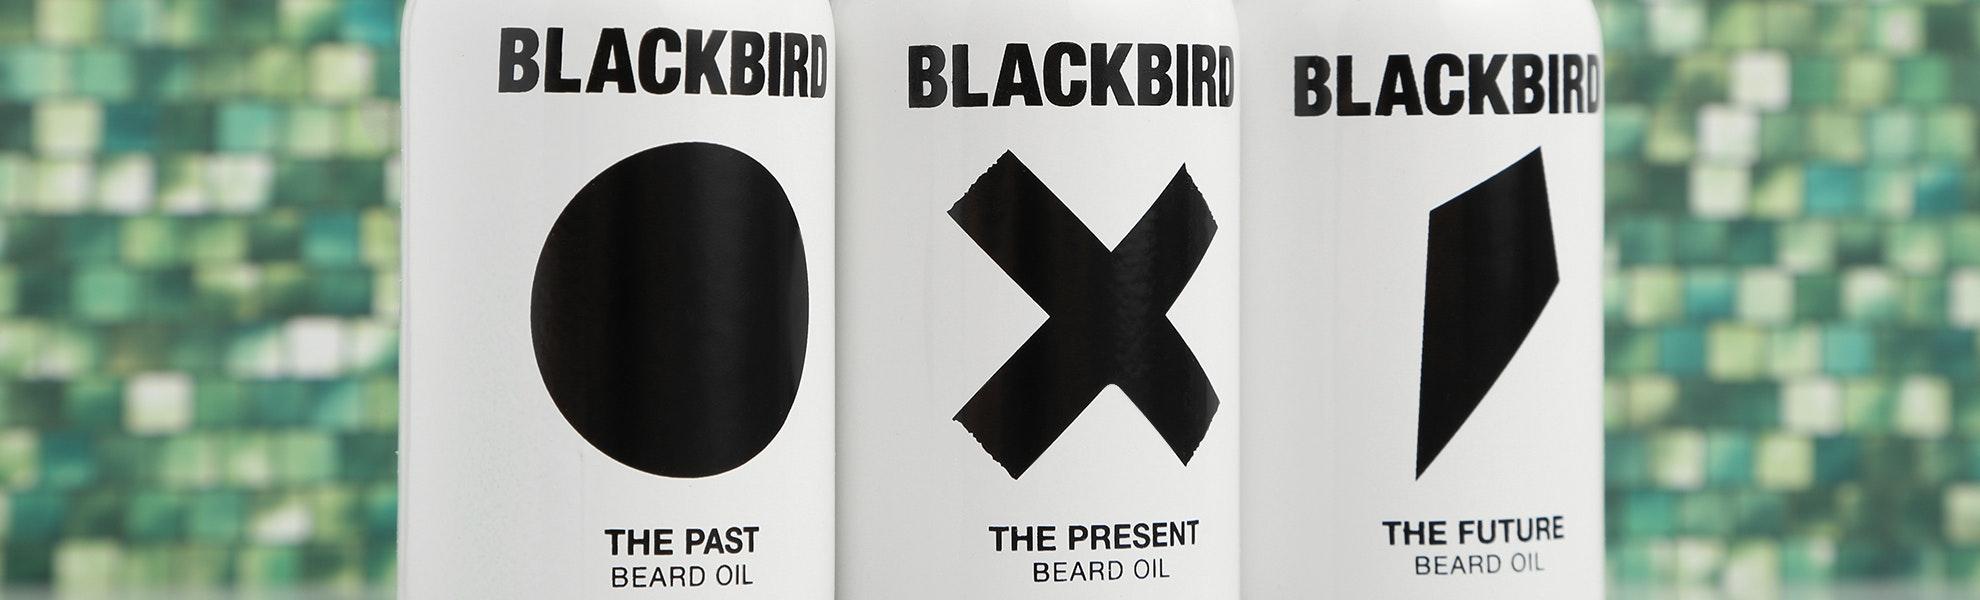 Blackbird Beard Oil